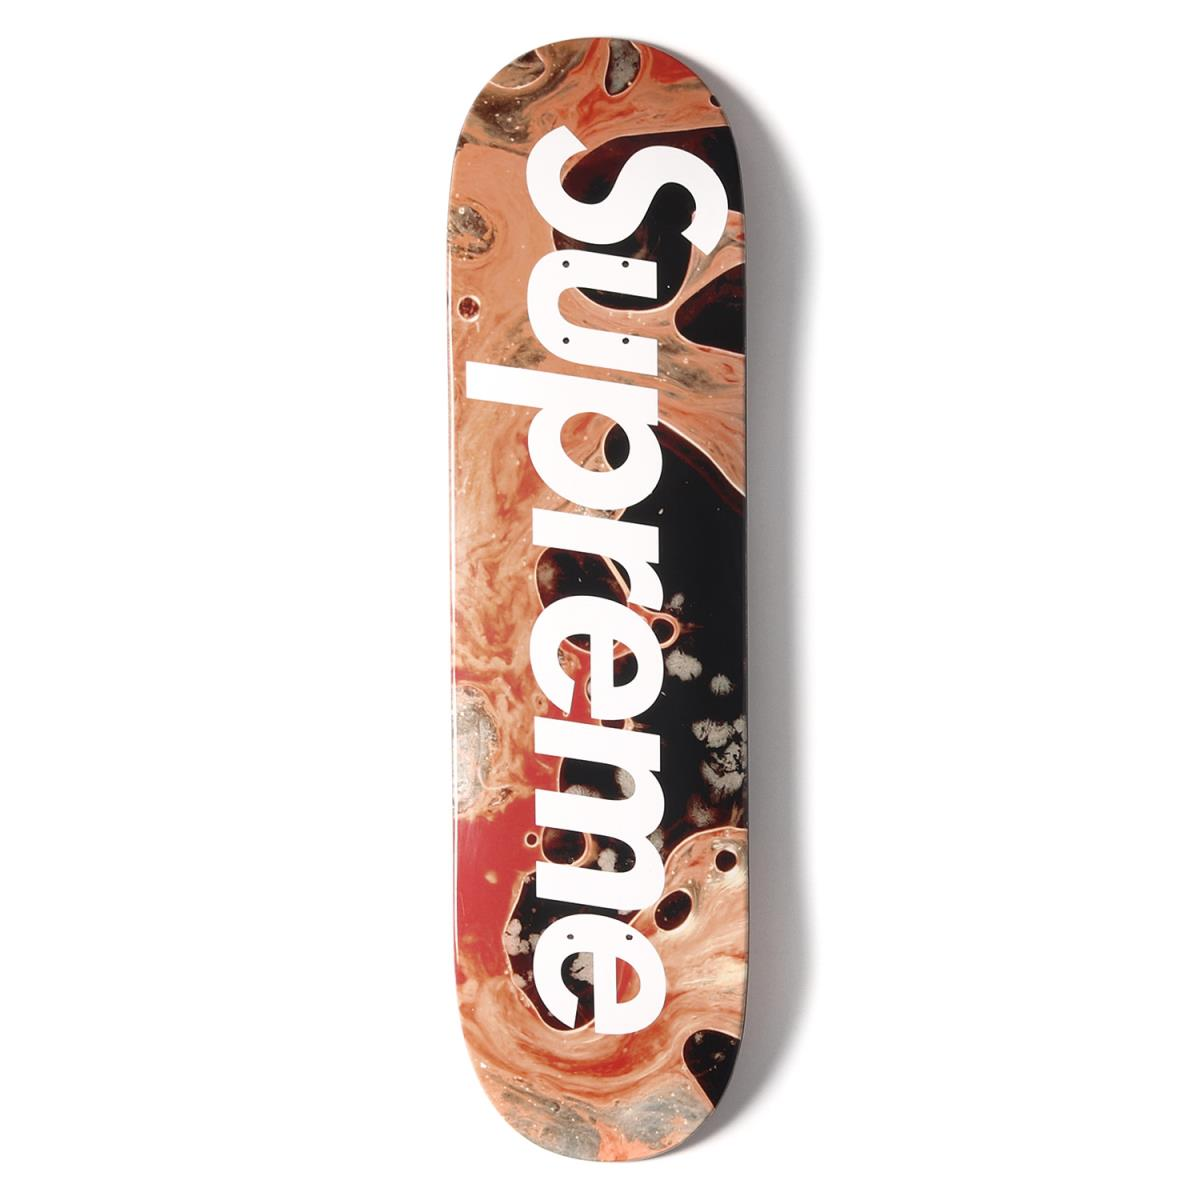 Supreme (シュプリーム) 17A/W ×Andres Serrano スケボーデッキ(Blood and Semen Skateboard) マルチ 【メンズ】【新品同様】【K2213】【中古】【あす楽☆対応可】